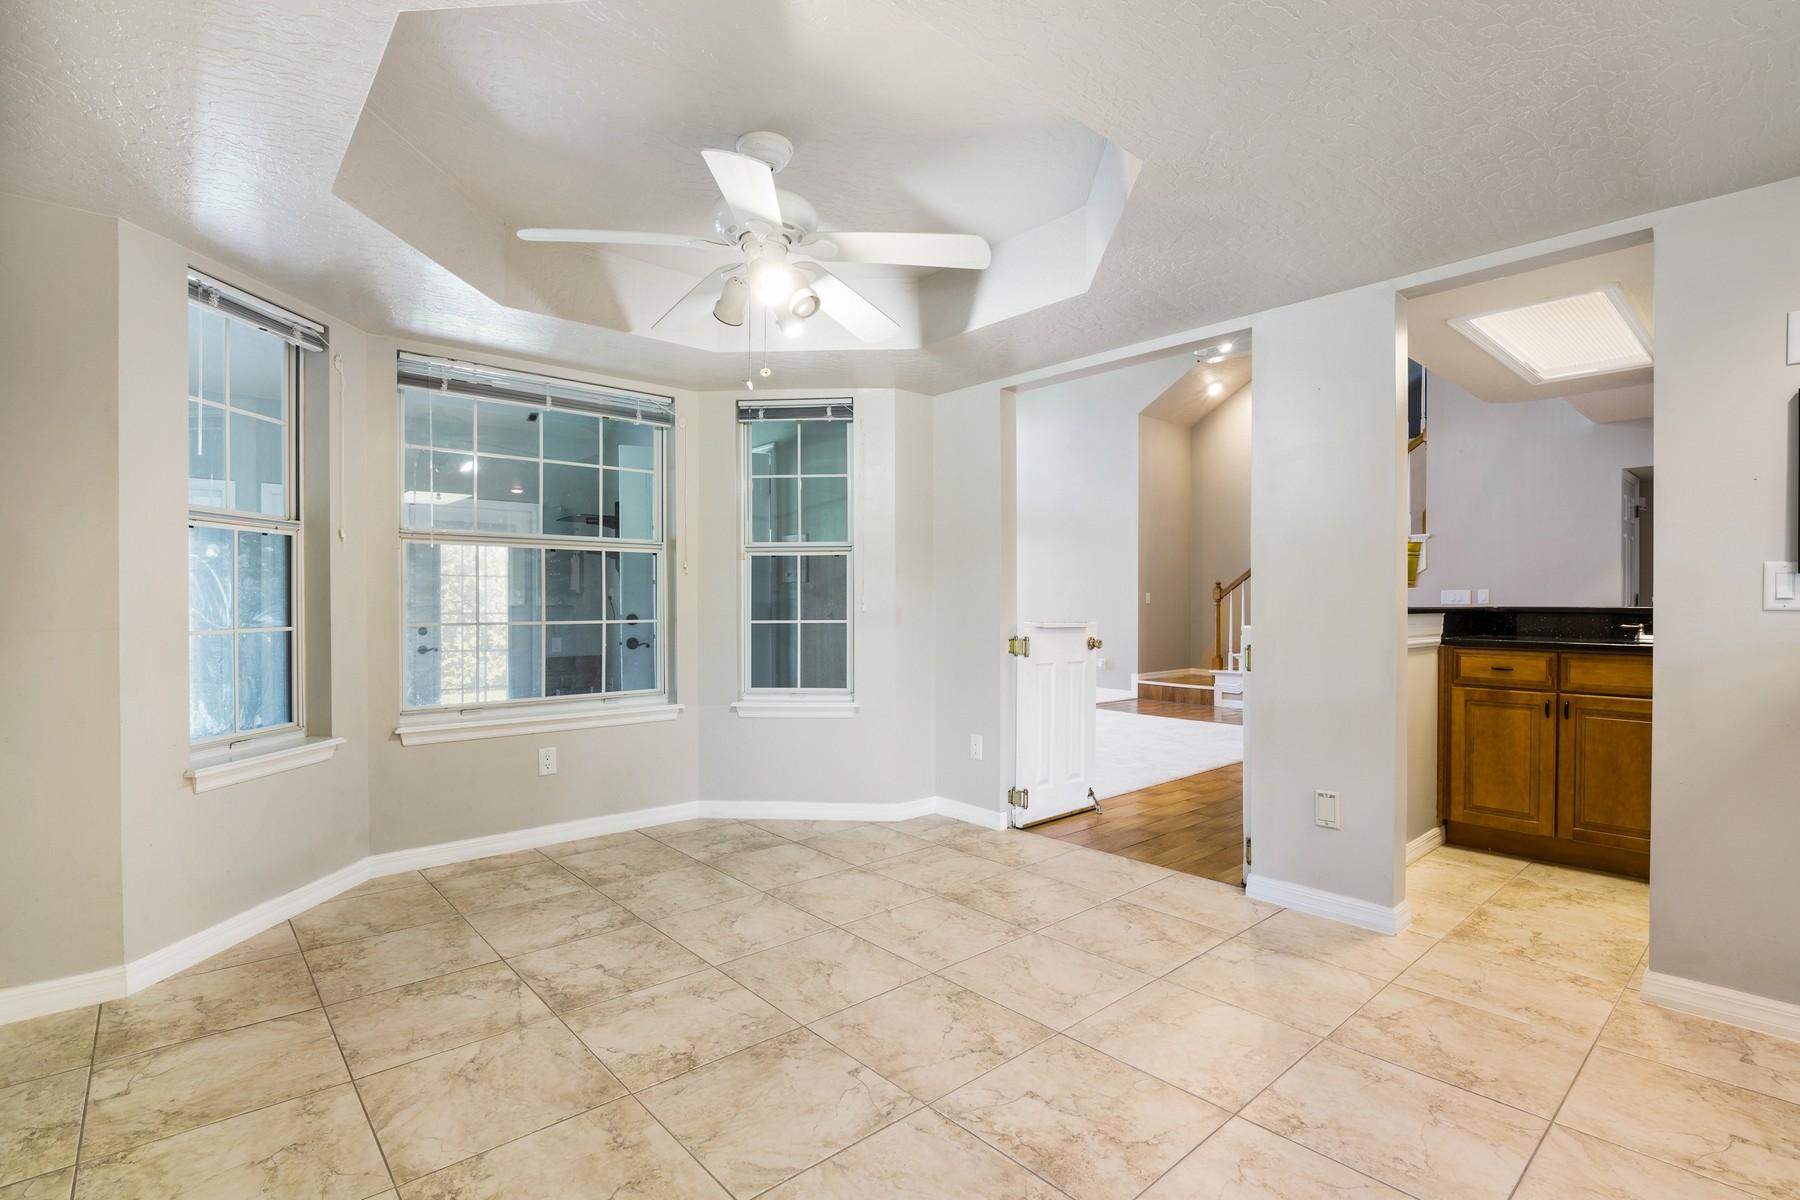 Additional photo for property listing at Beautiful, large home 2260 Mockingbird Lane Melbourne, Florida 32903 United States